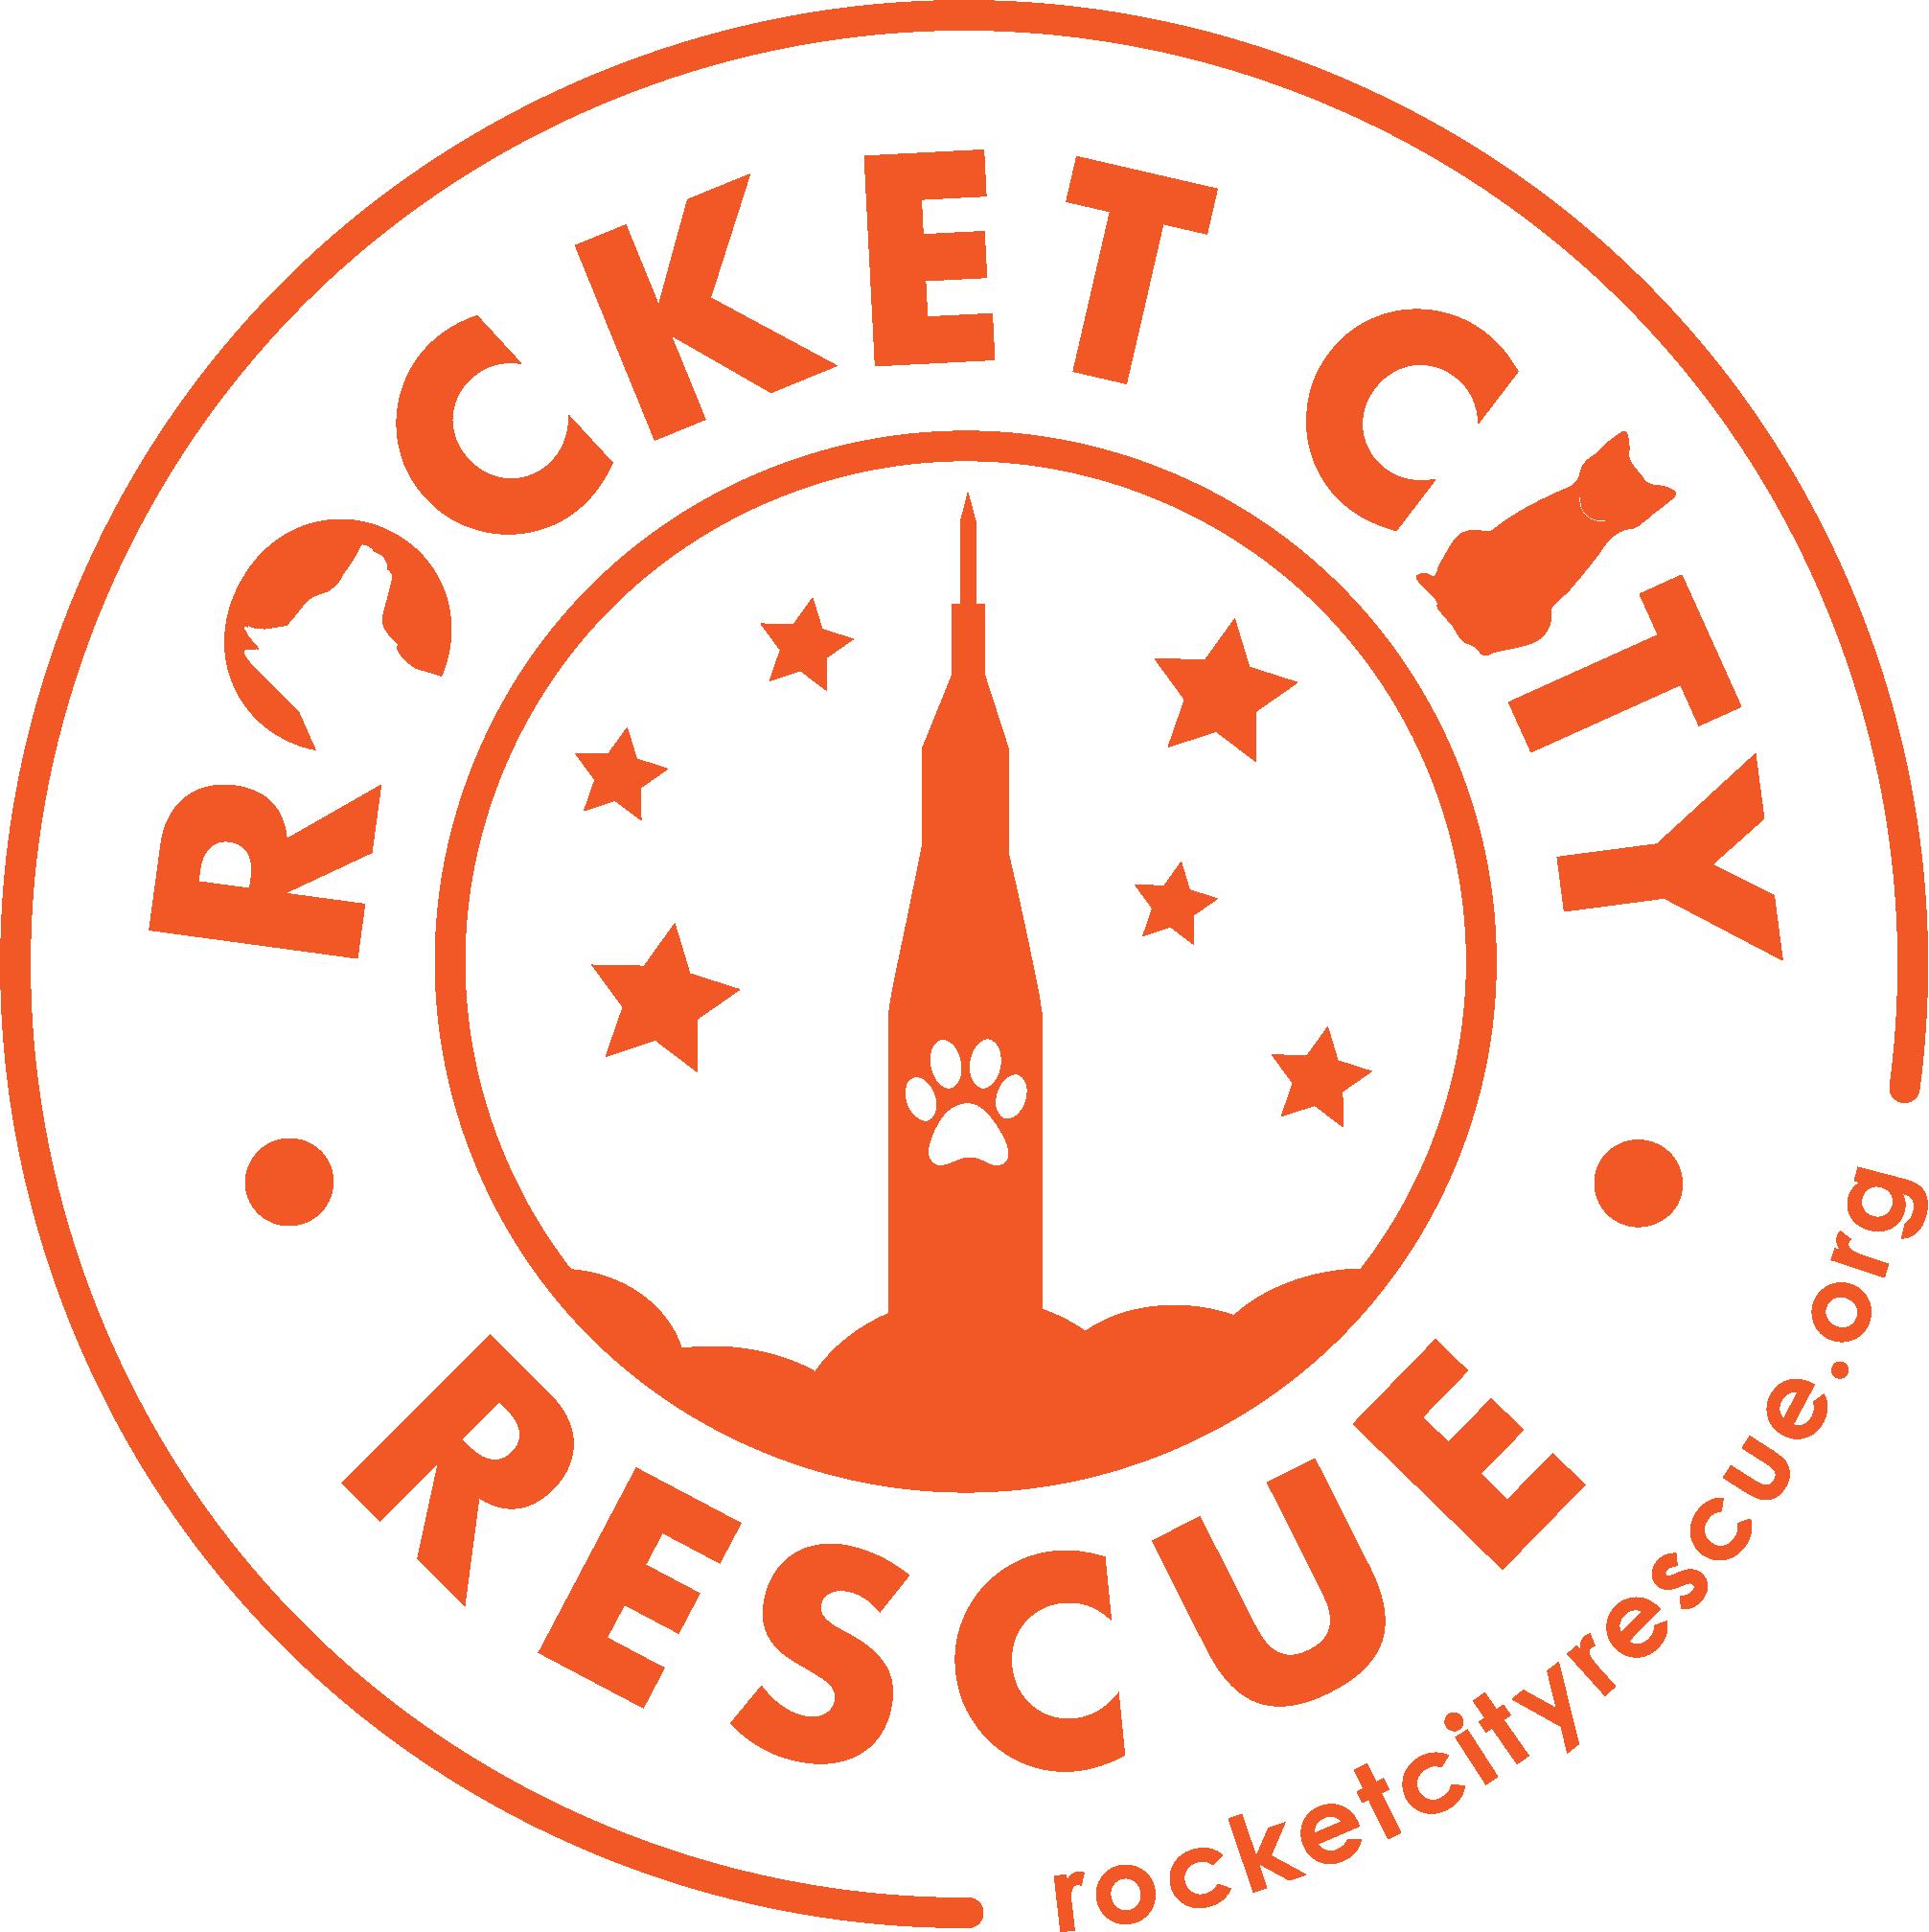 Rocket City Rescue Inc